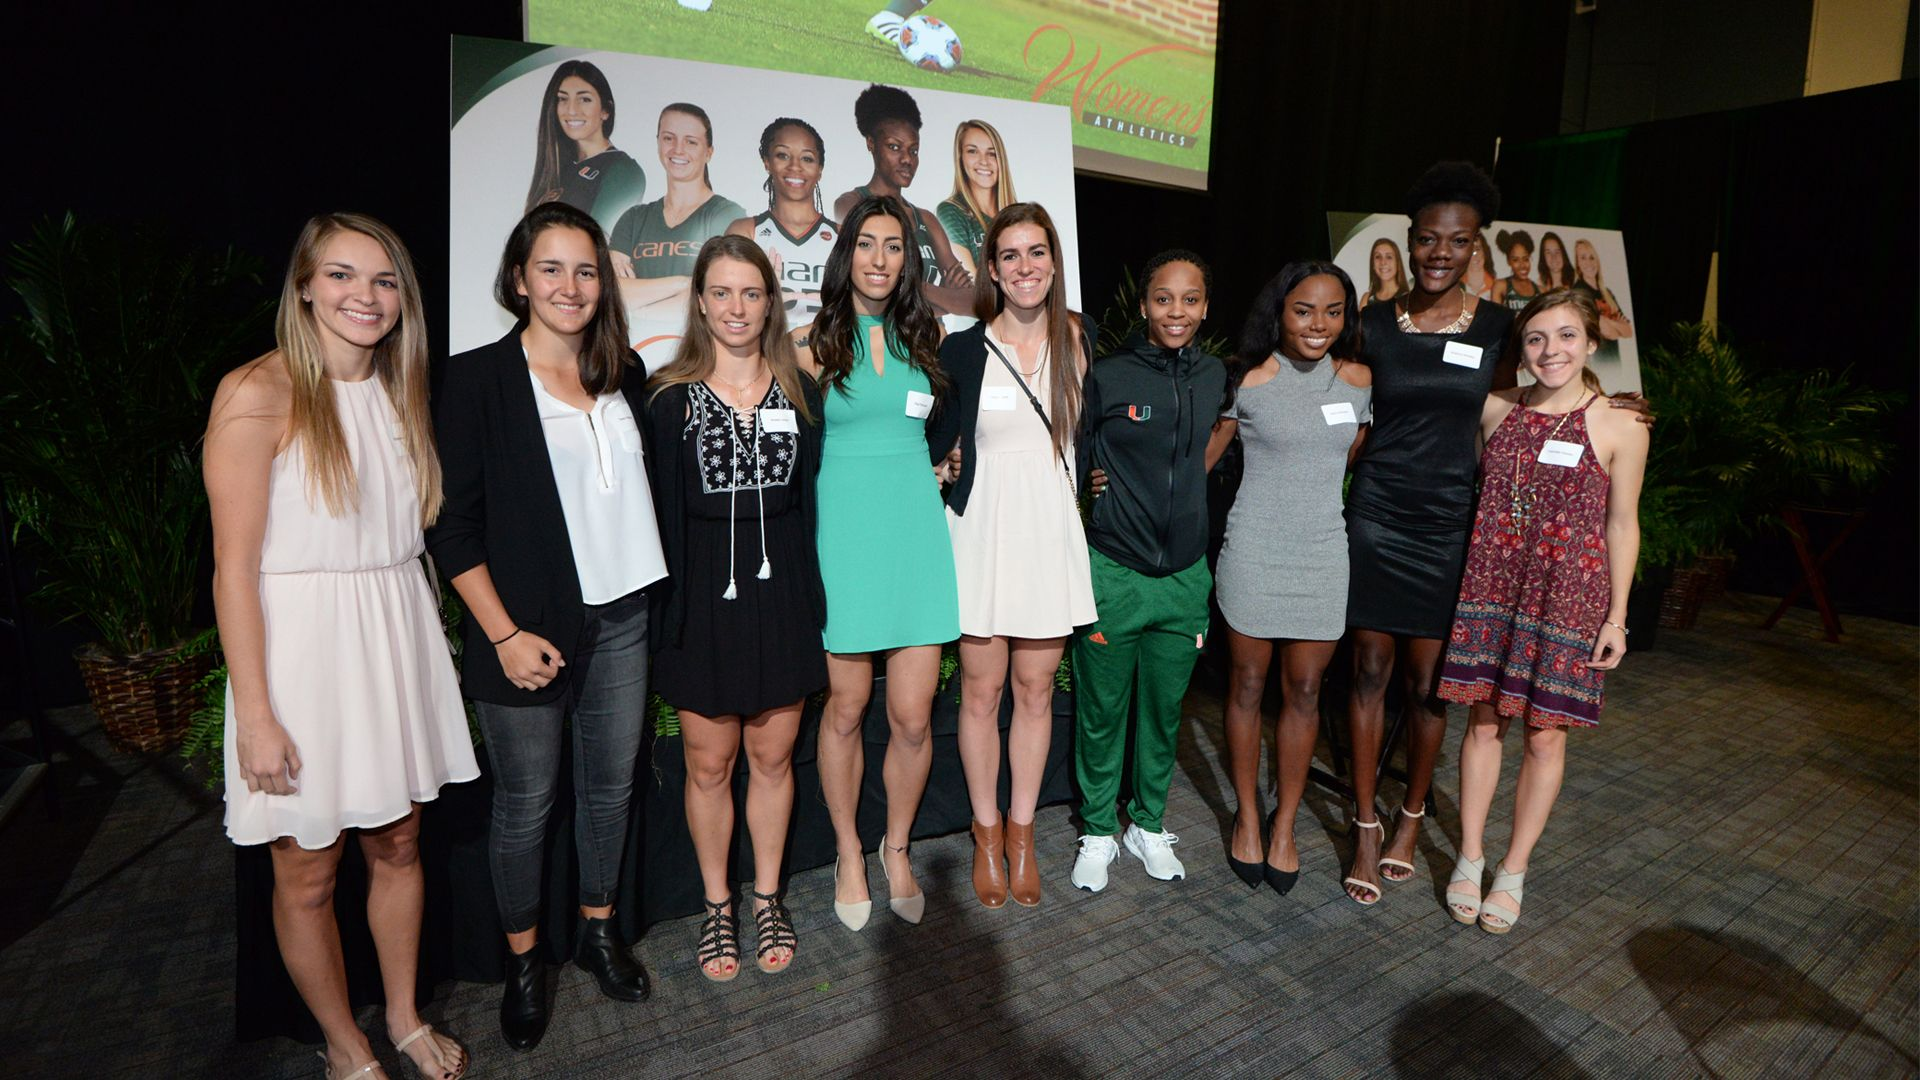 Women's Athletics Leadership Support